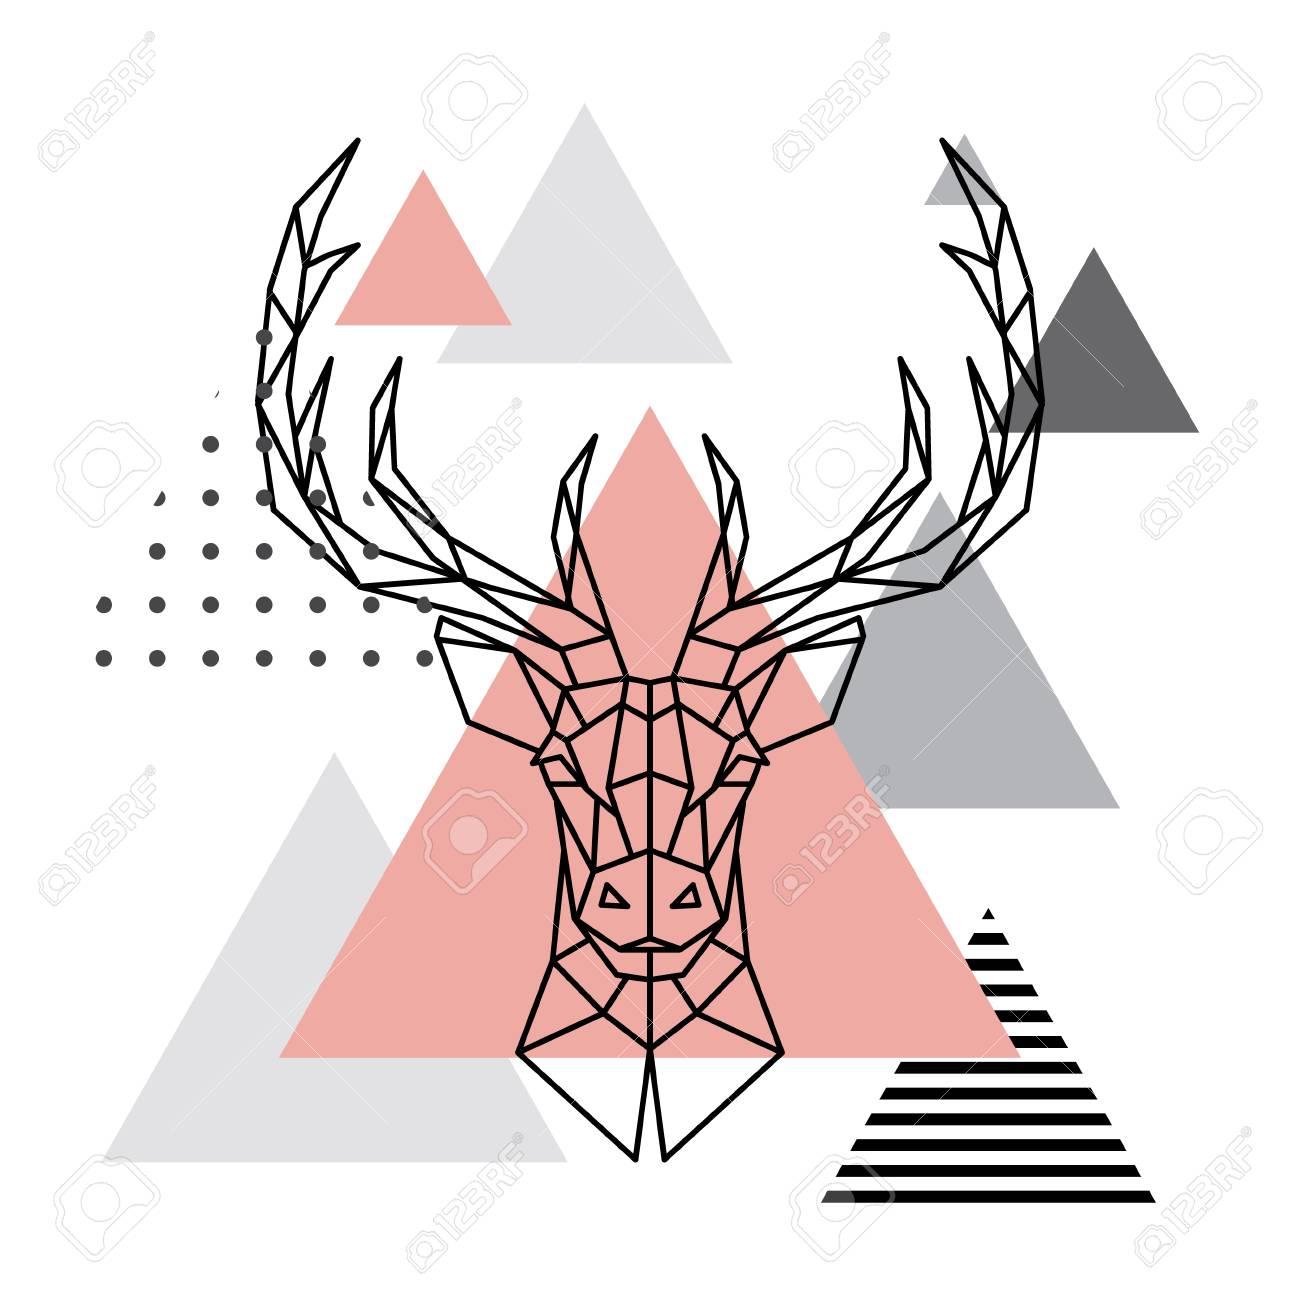 geometric head of a deer on a scandinavian background